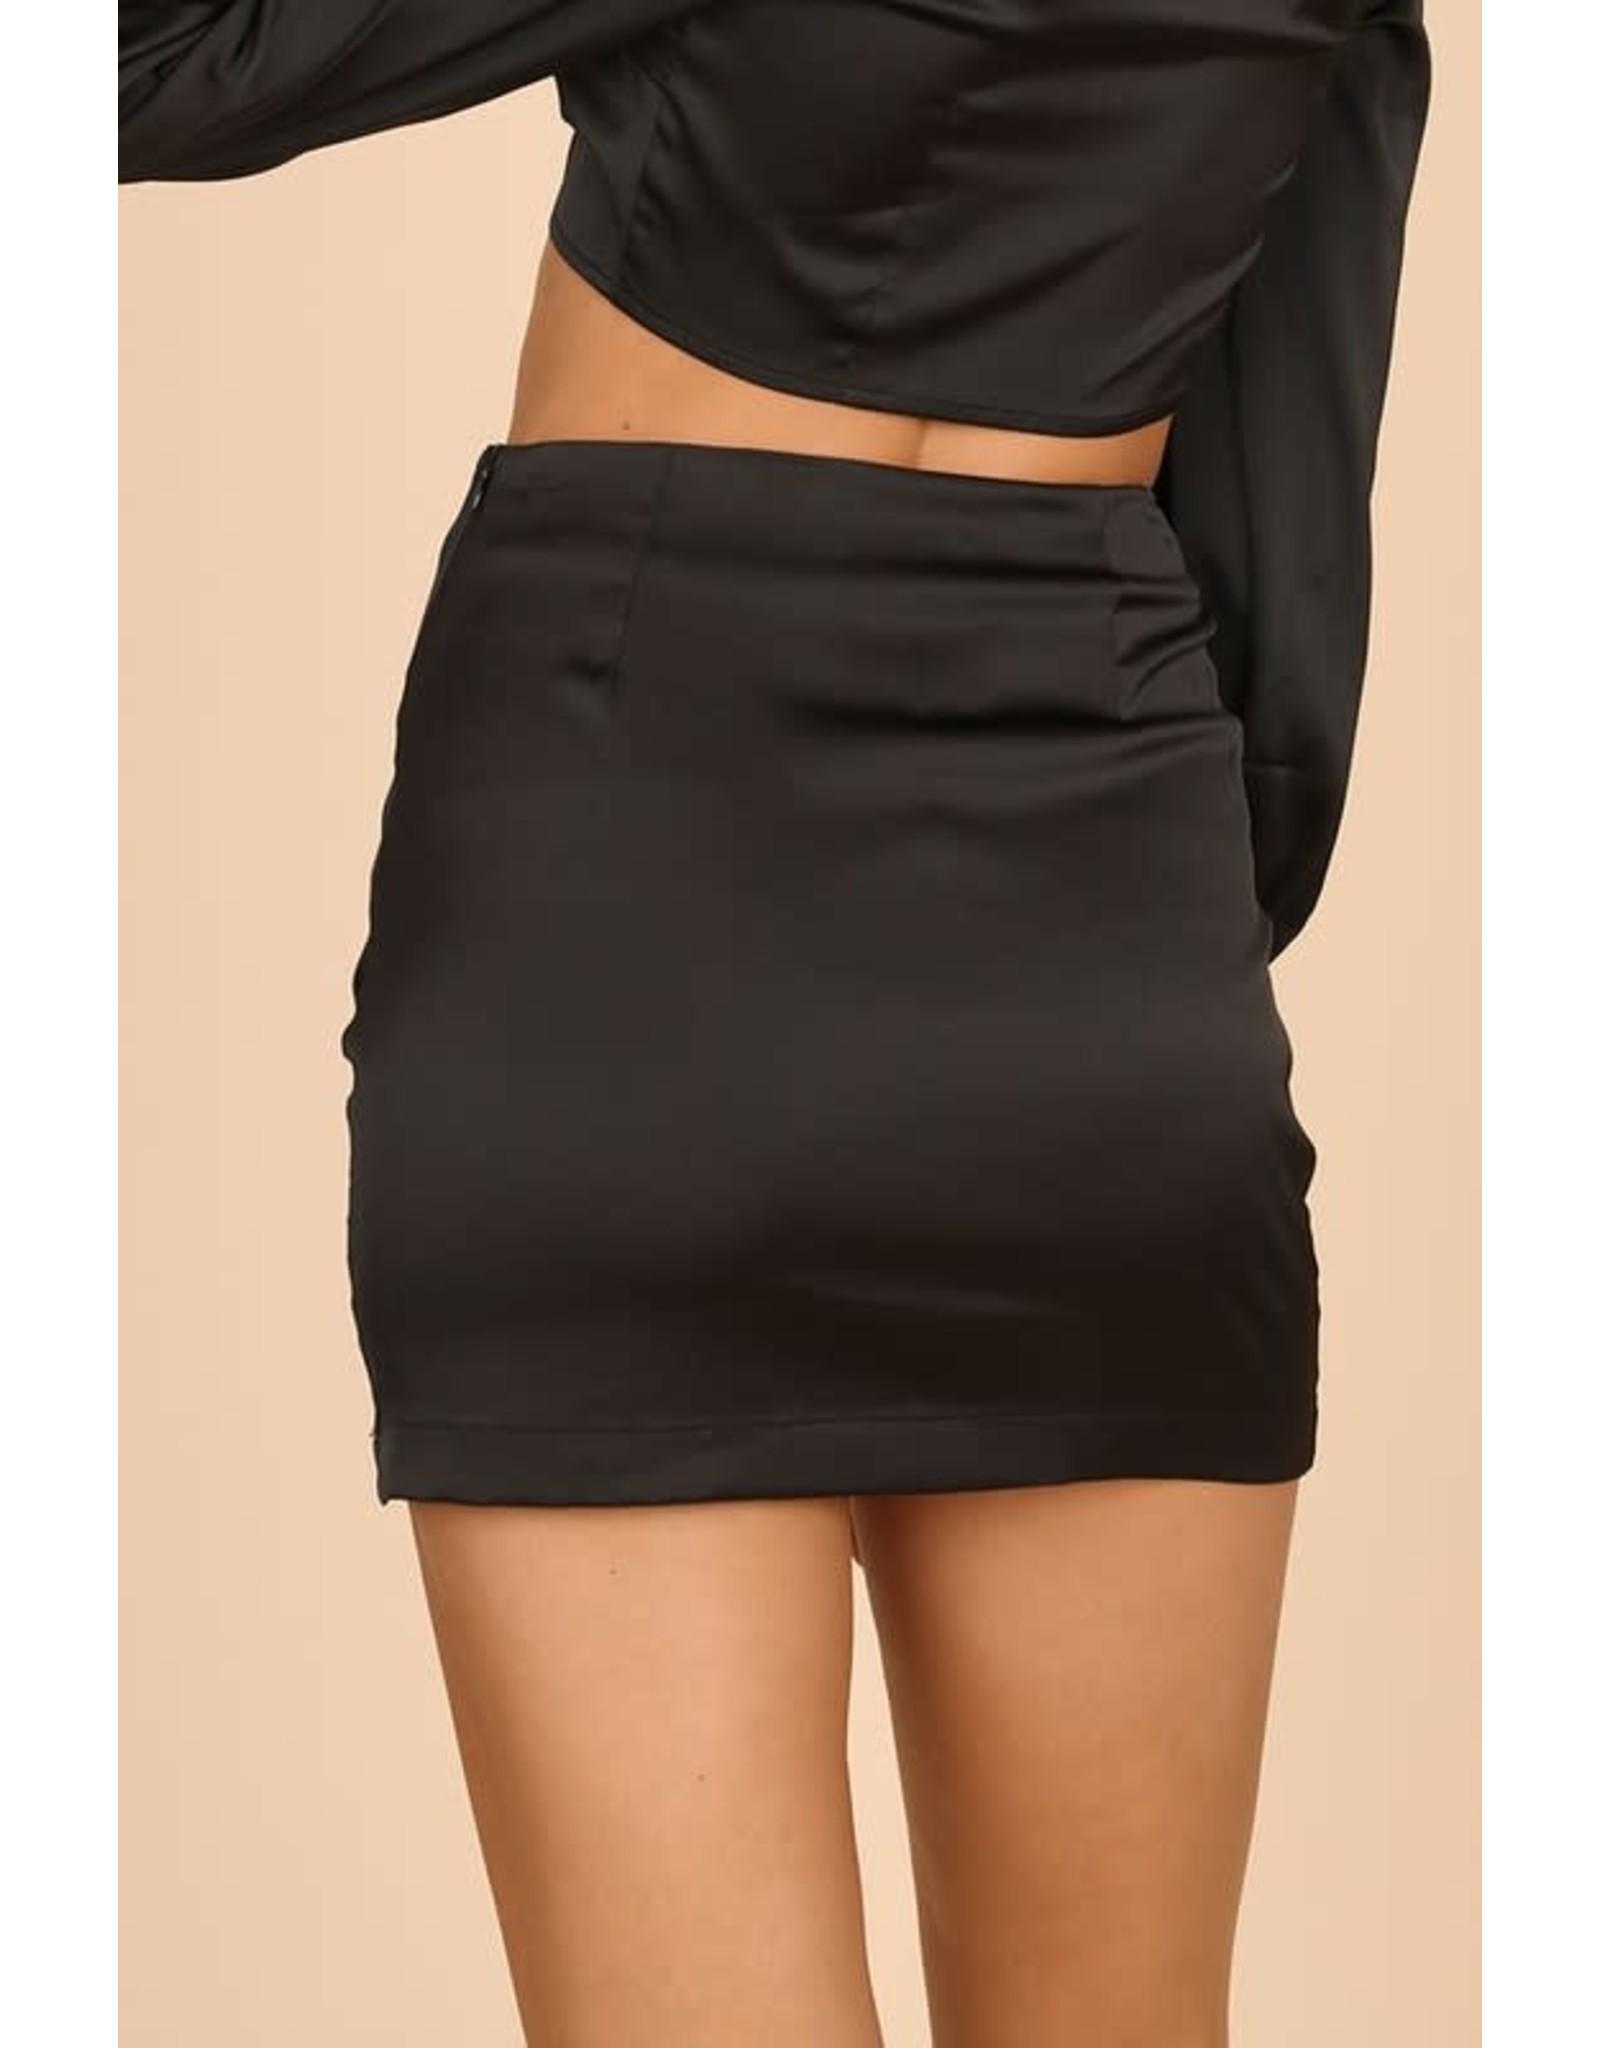 Keep Them Coming Skirt